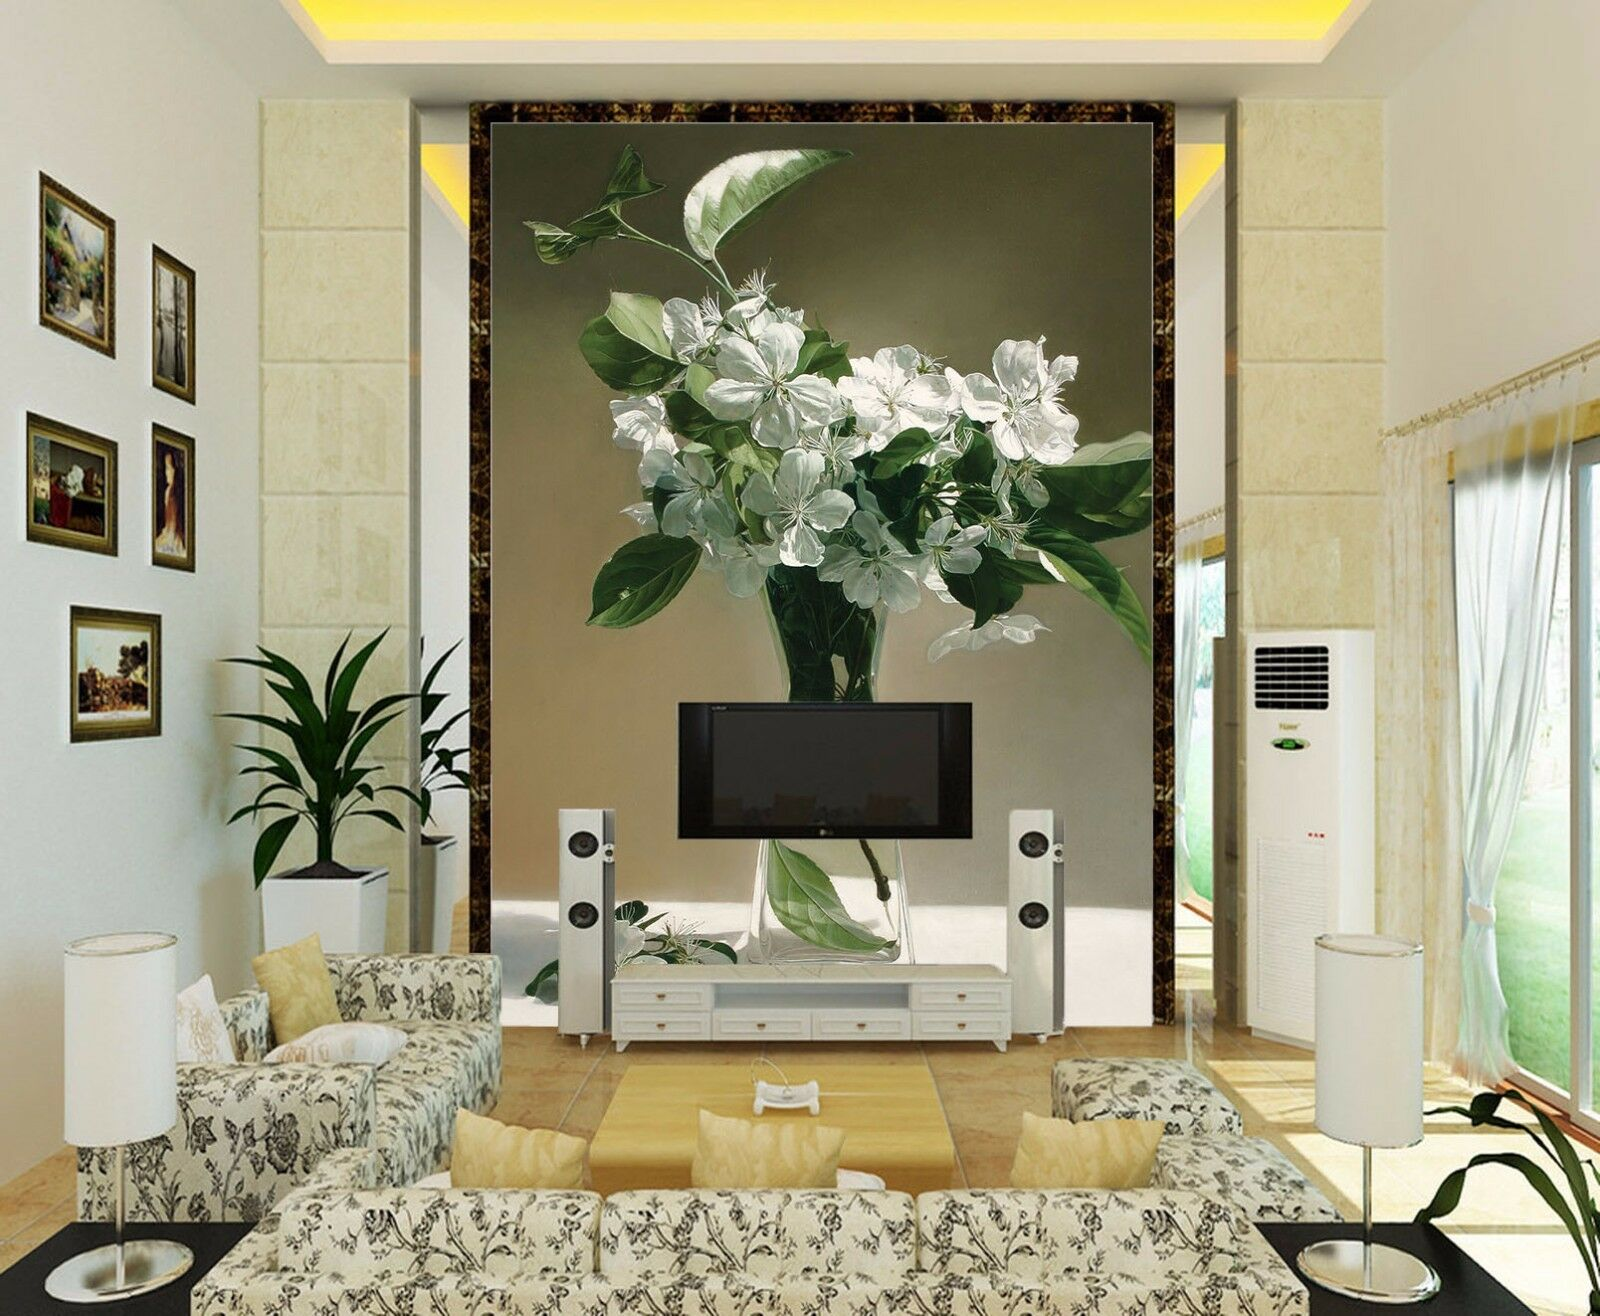 3D Pear Flowers Vase 7 Wall Paper Murals Wall Print Wall Wallpaper Mural AU Kyra